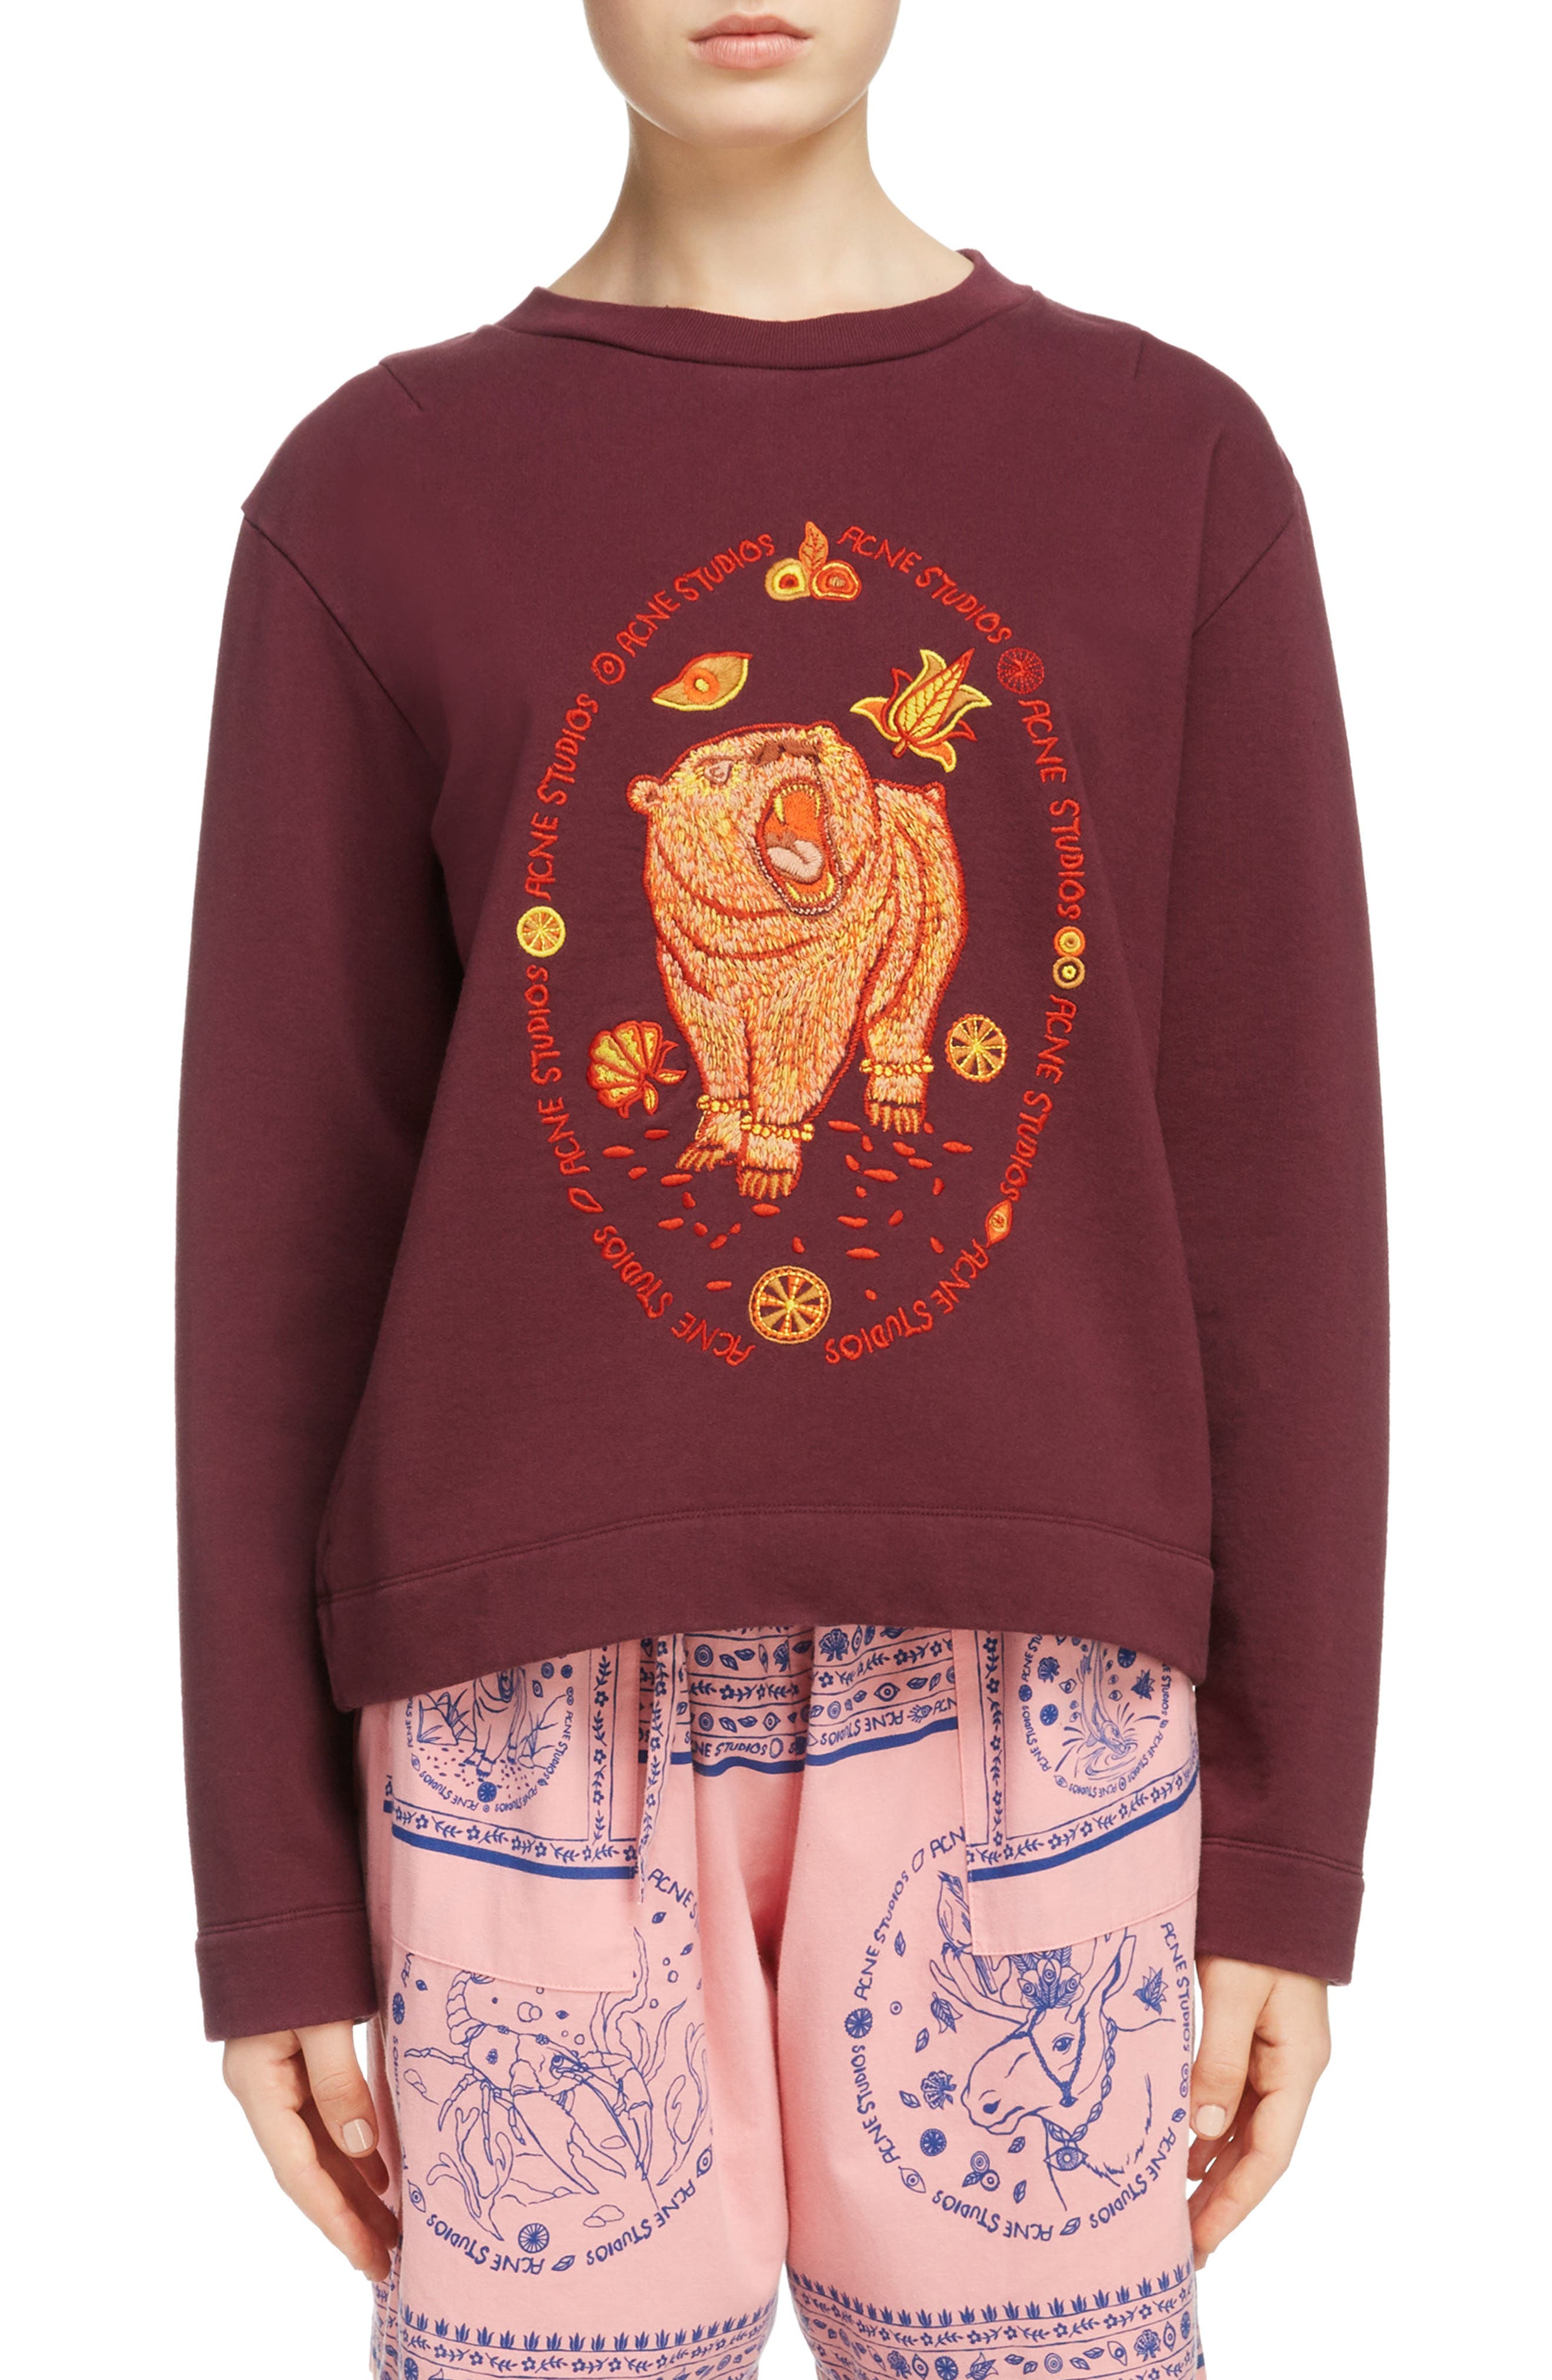 Alternate Image 1 Selected - Acne Studios Oslavi Embroidered Bear Sweatshirt